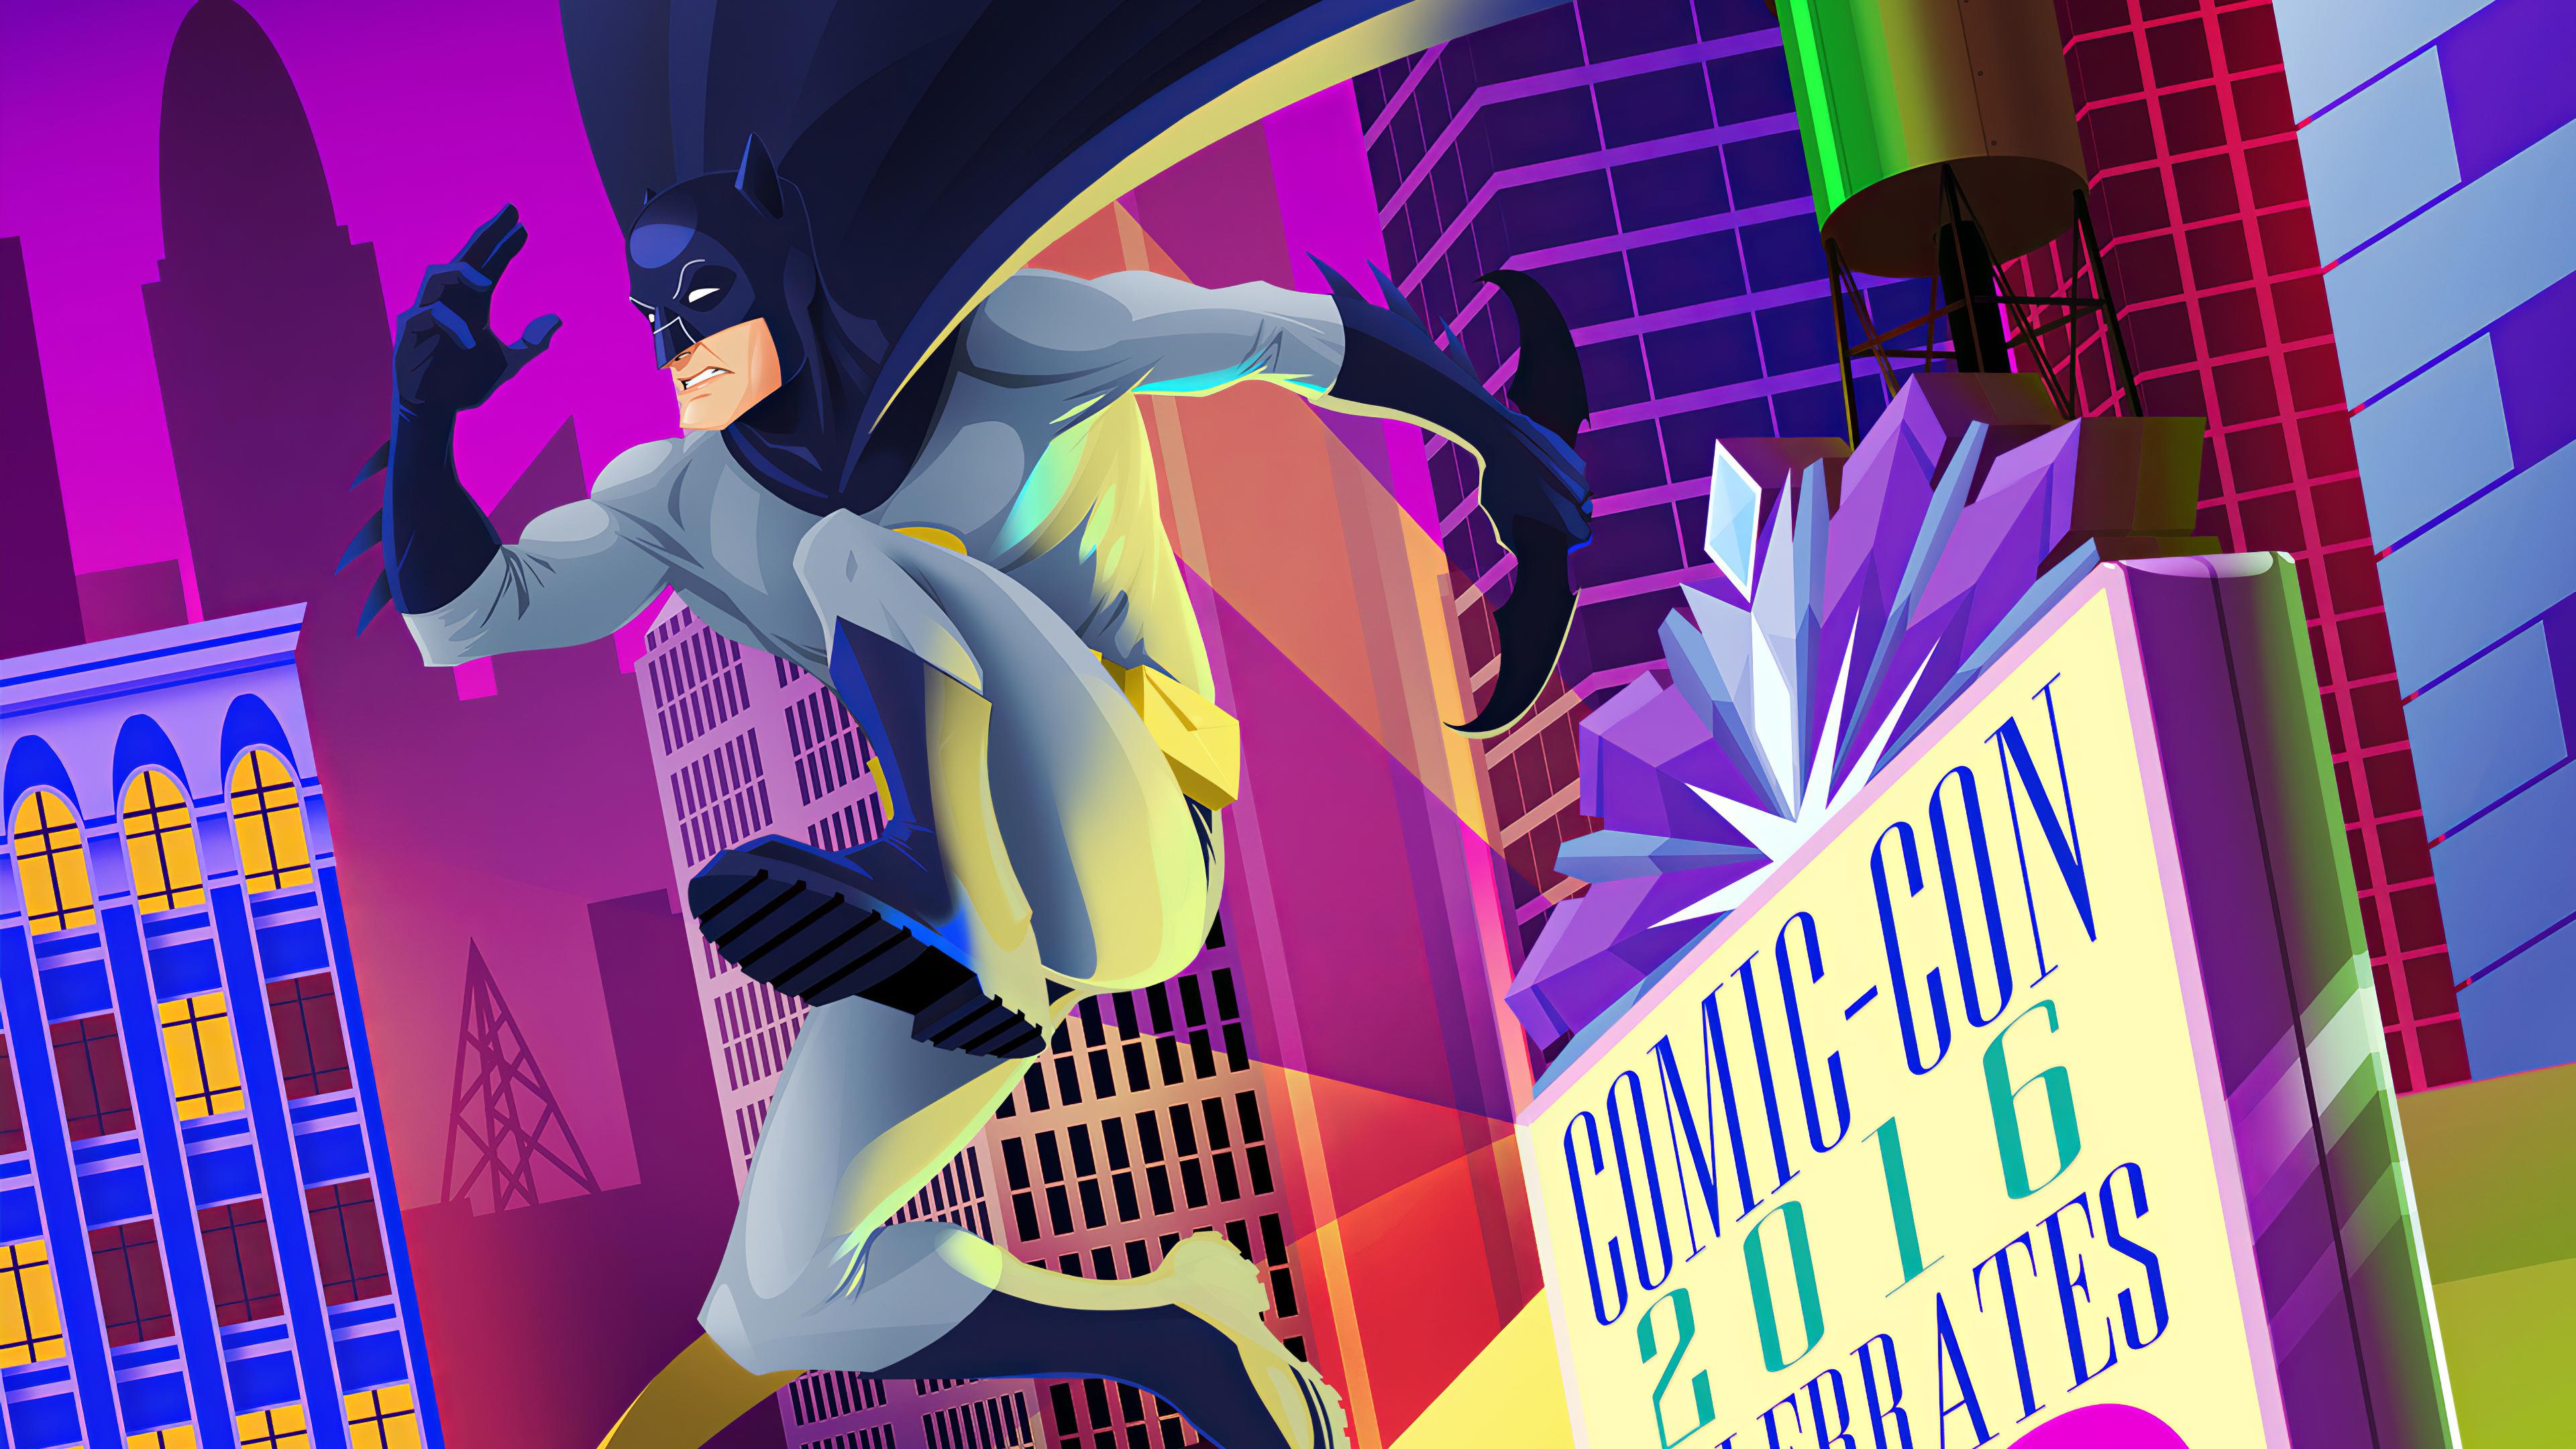 batman comic 1581355317 - Batman Comic - Batman Comic wallpapers, Batman Comic 4k wallpapers, Batman Art wallpapers 4k